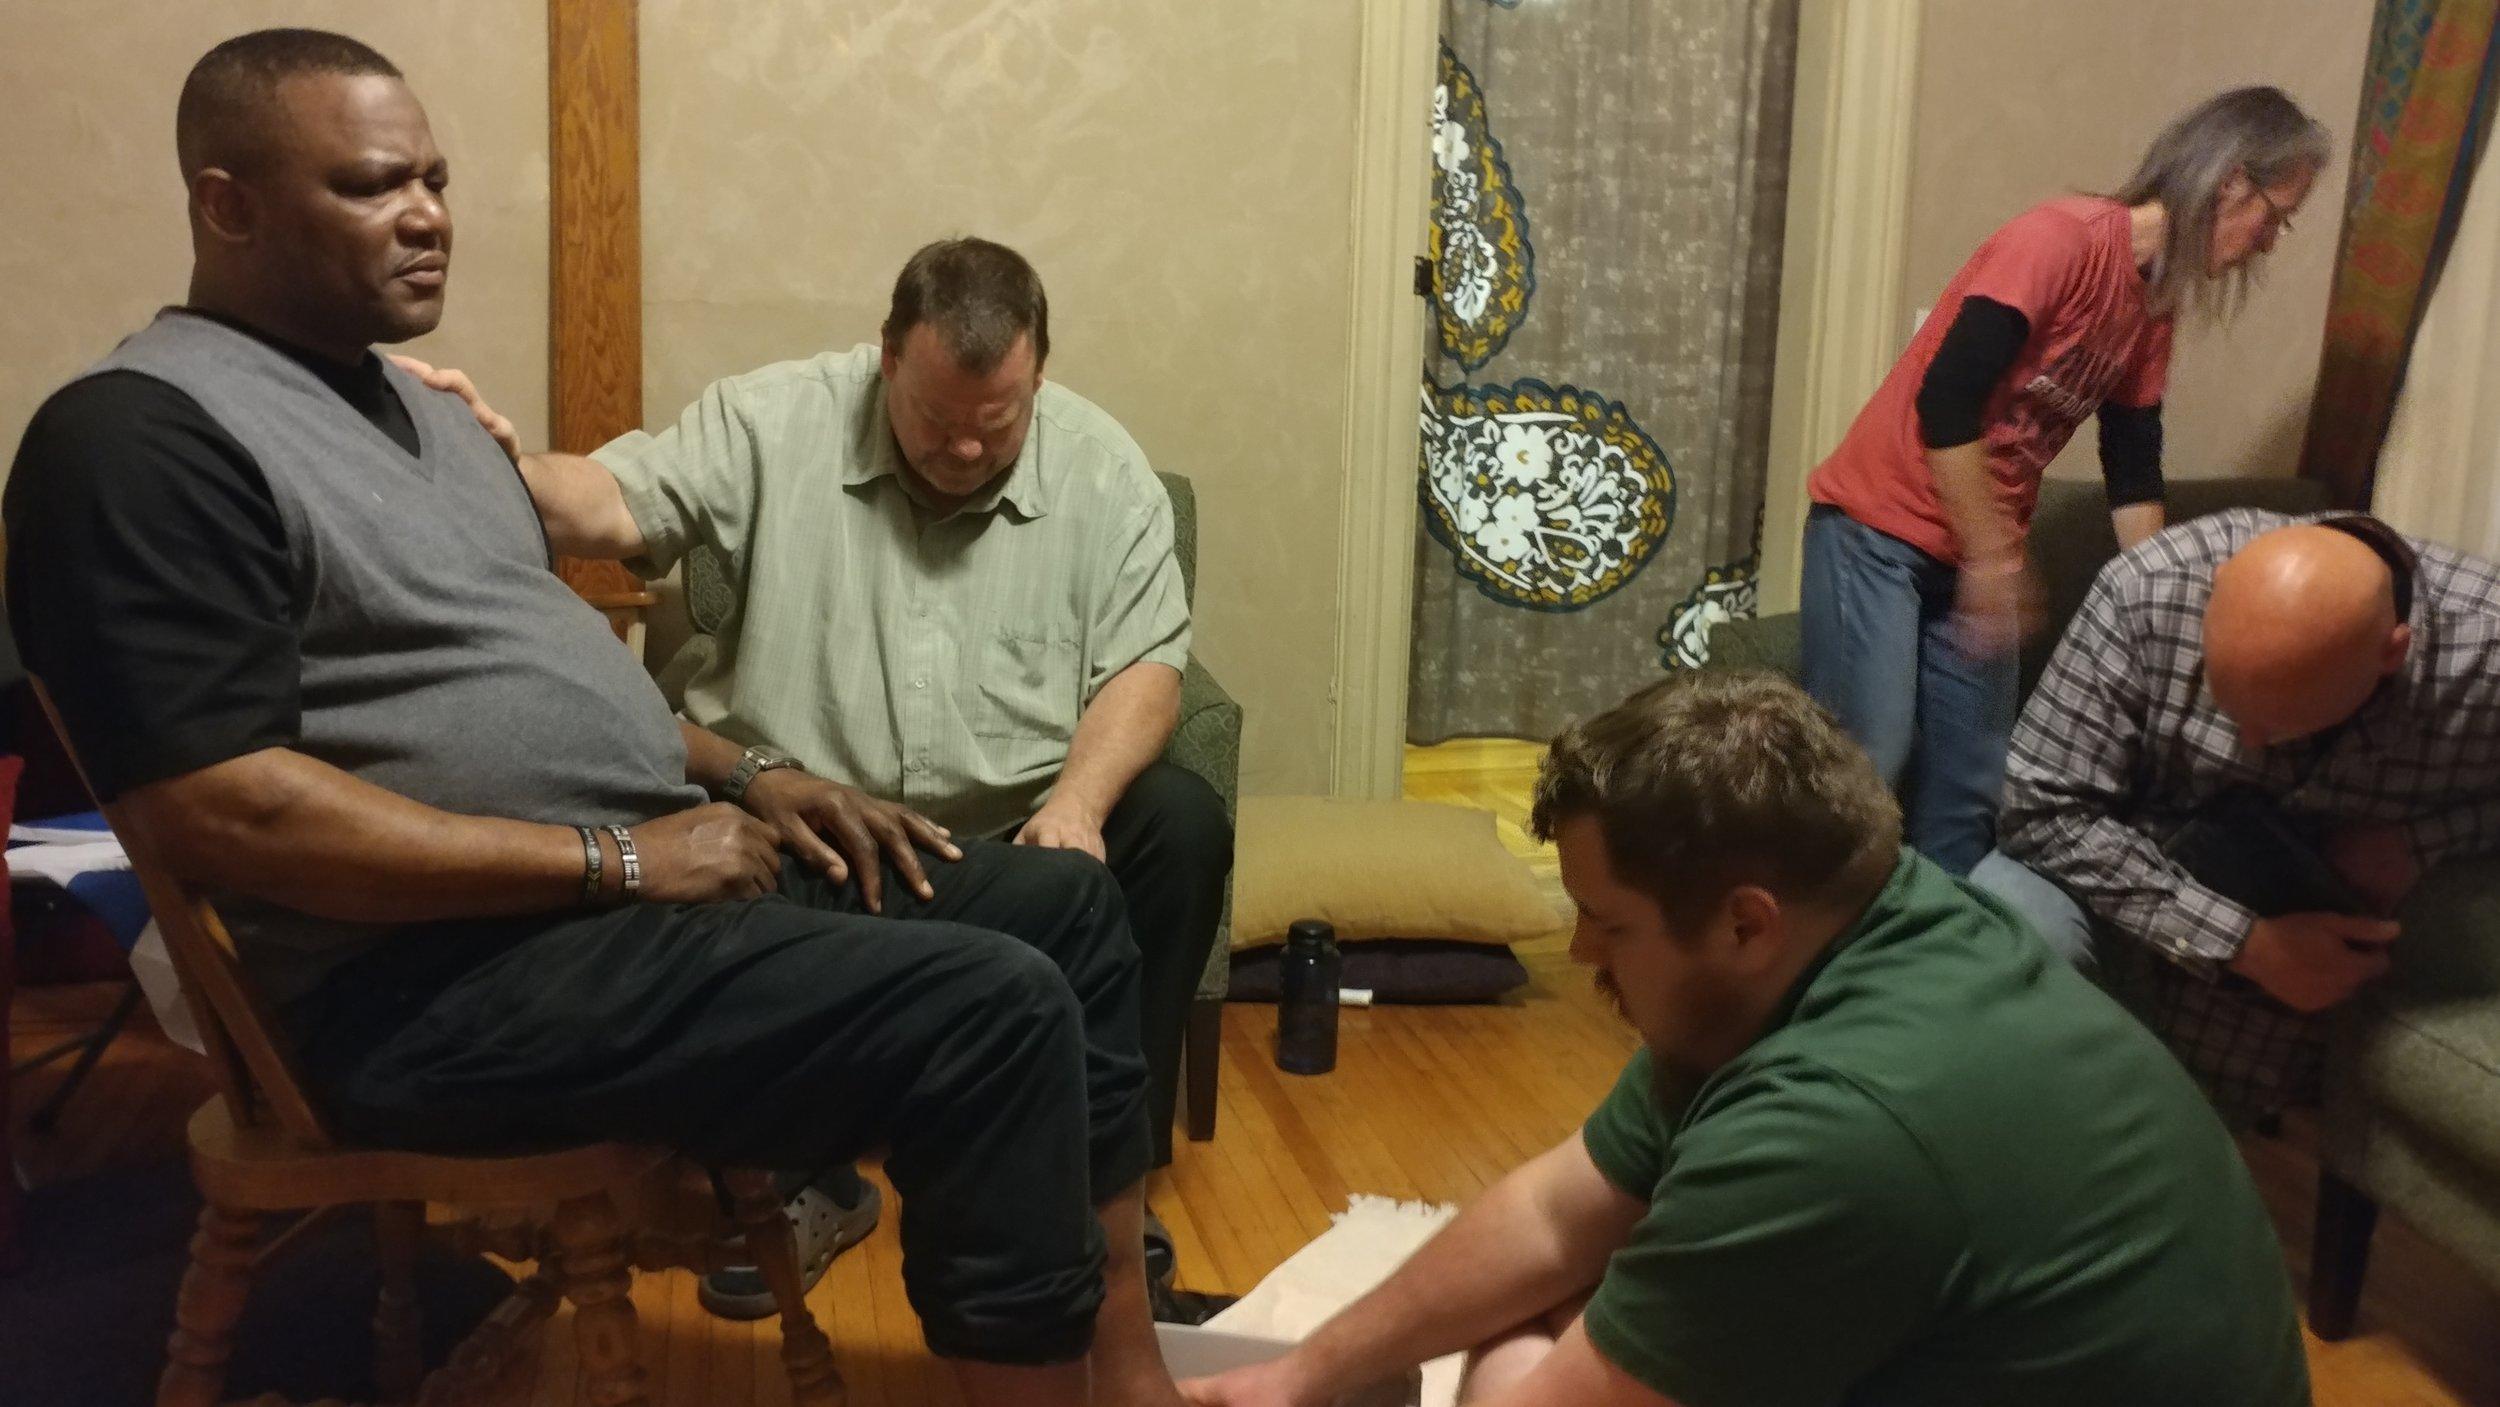 Washing Earl's feet at Thur. night meeting.jpg